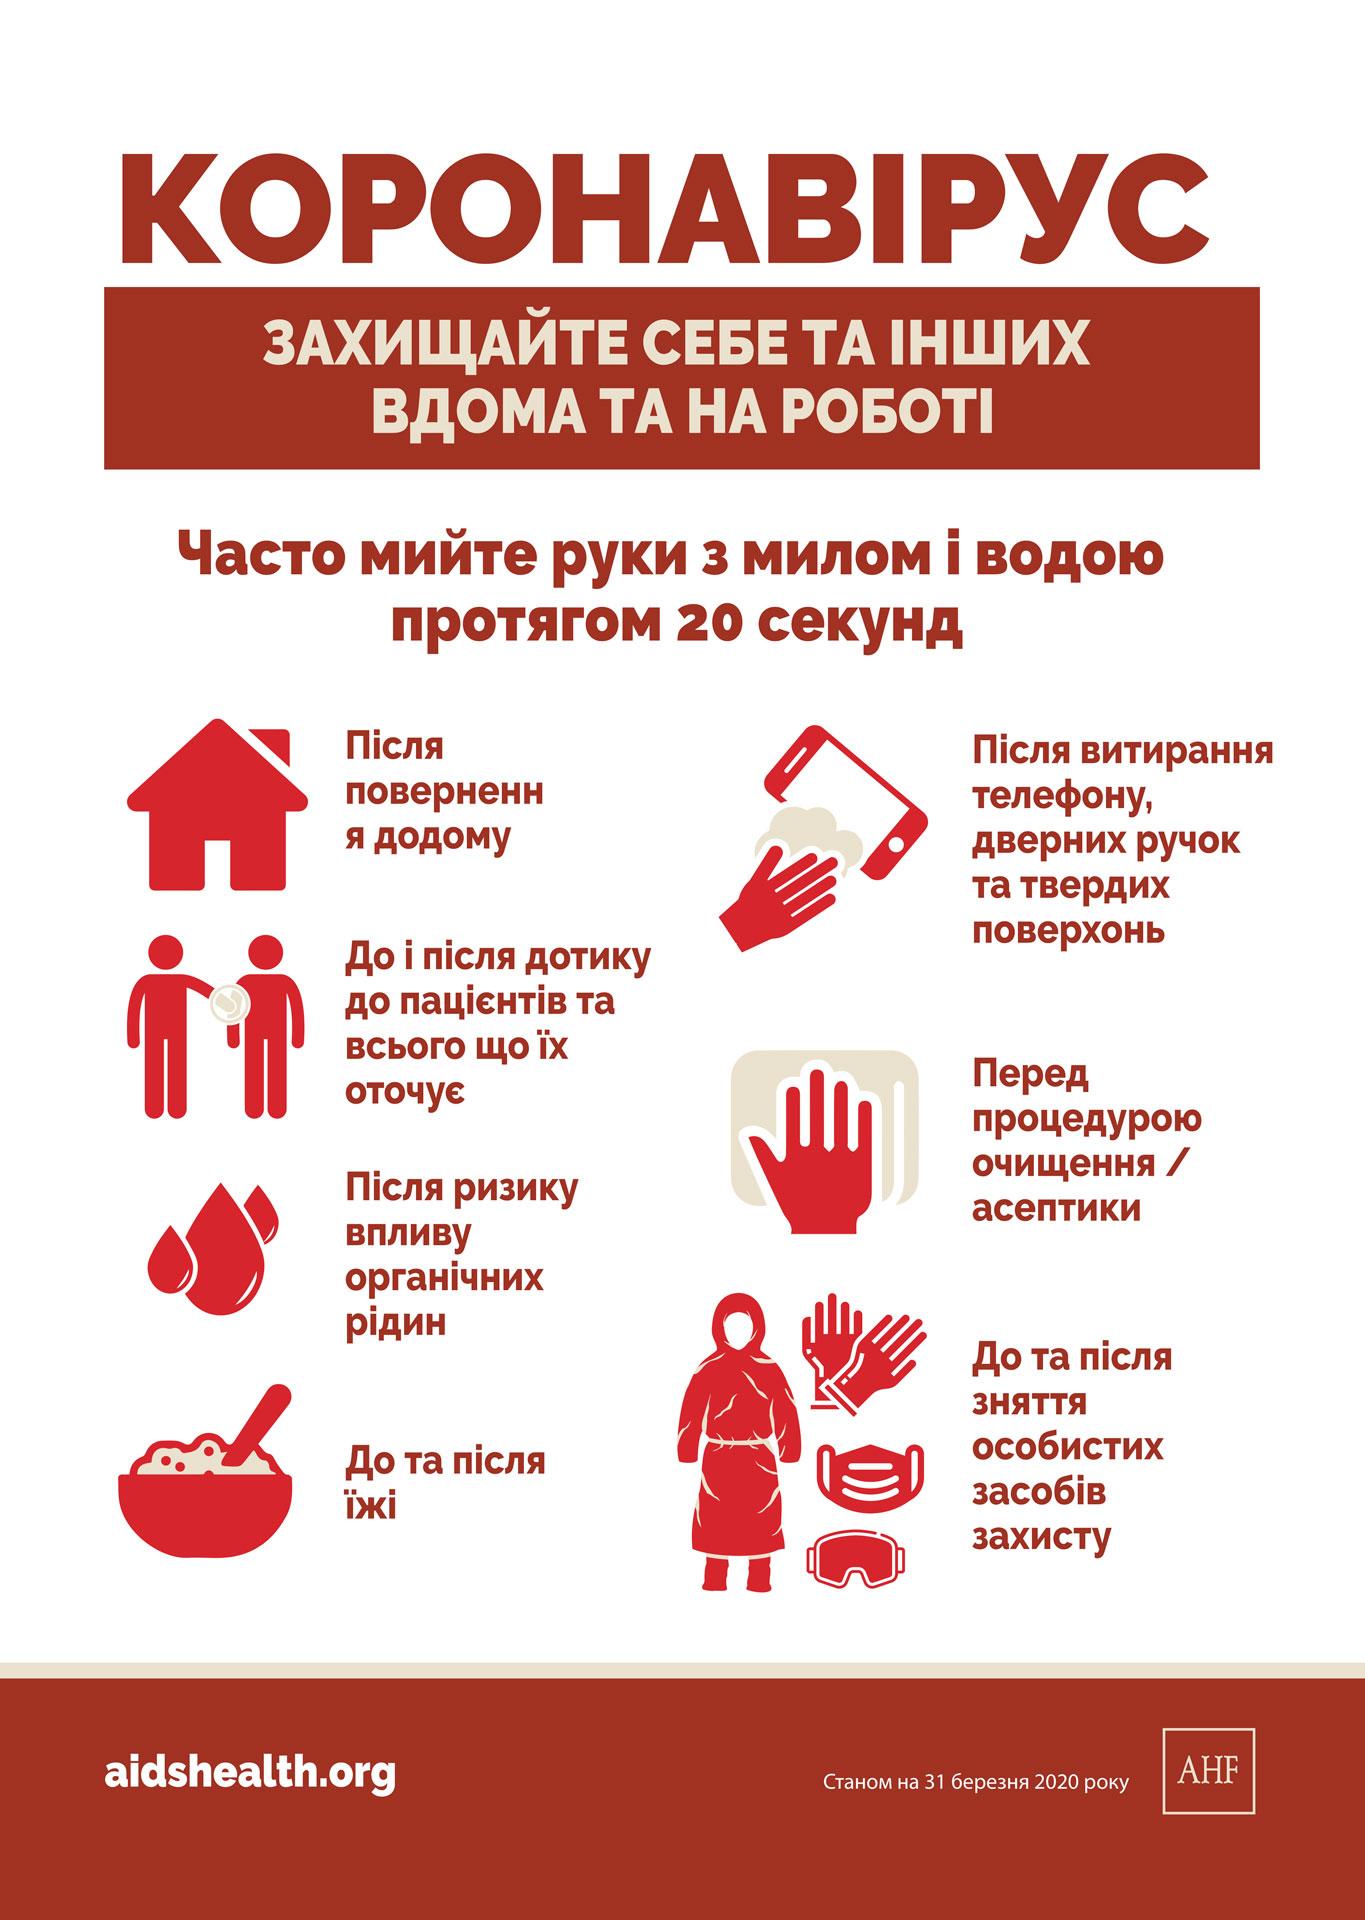 20 Iec Covid19 Advisory Hcw Ukrainian Updated March.31.2020 (1)